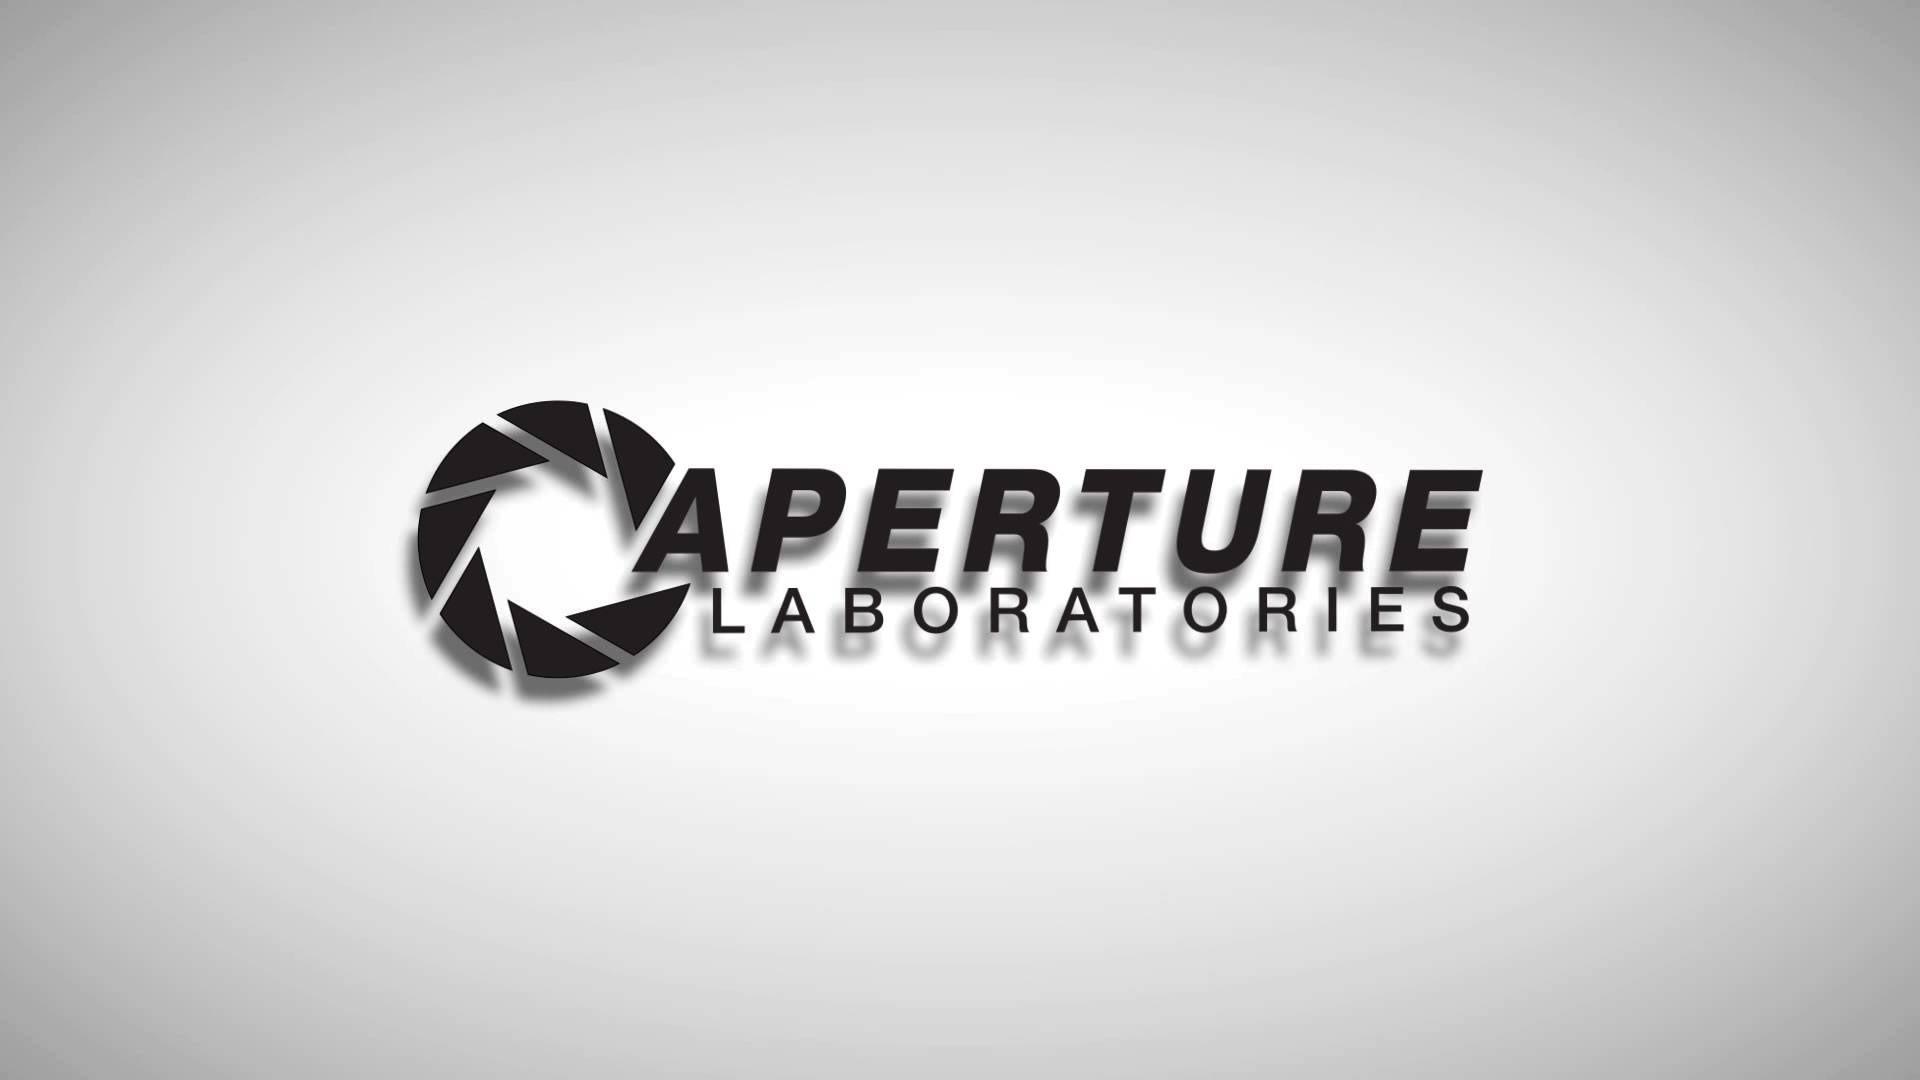 aperture science wallpaper 1366×768